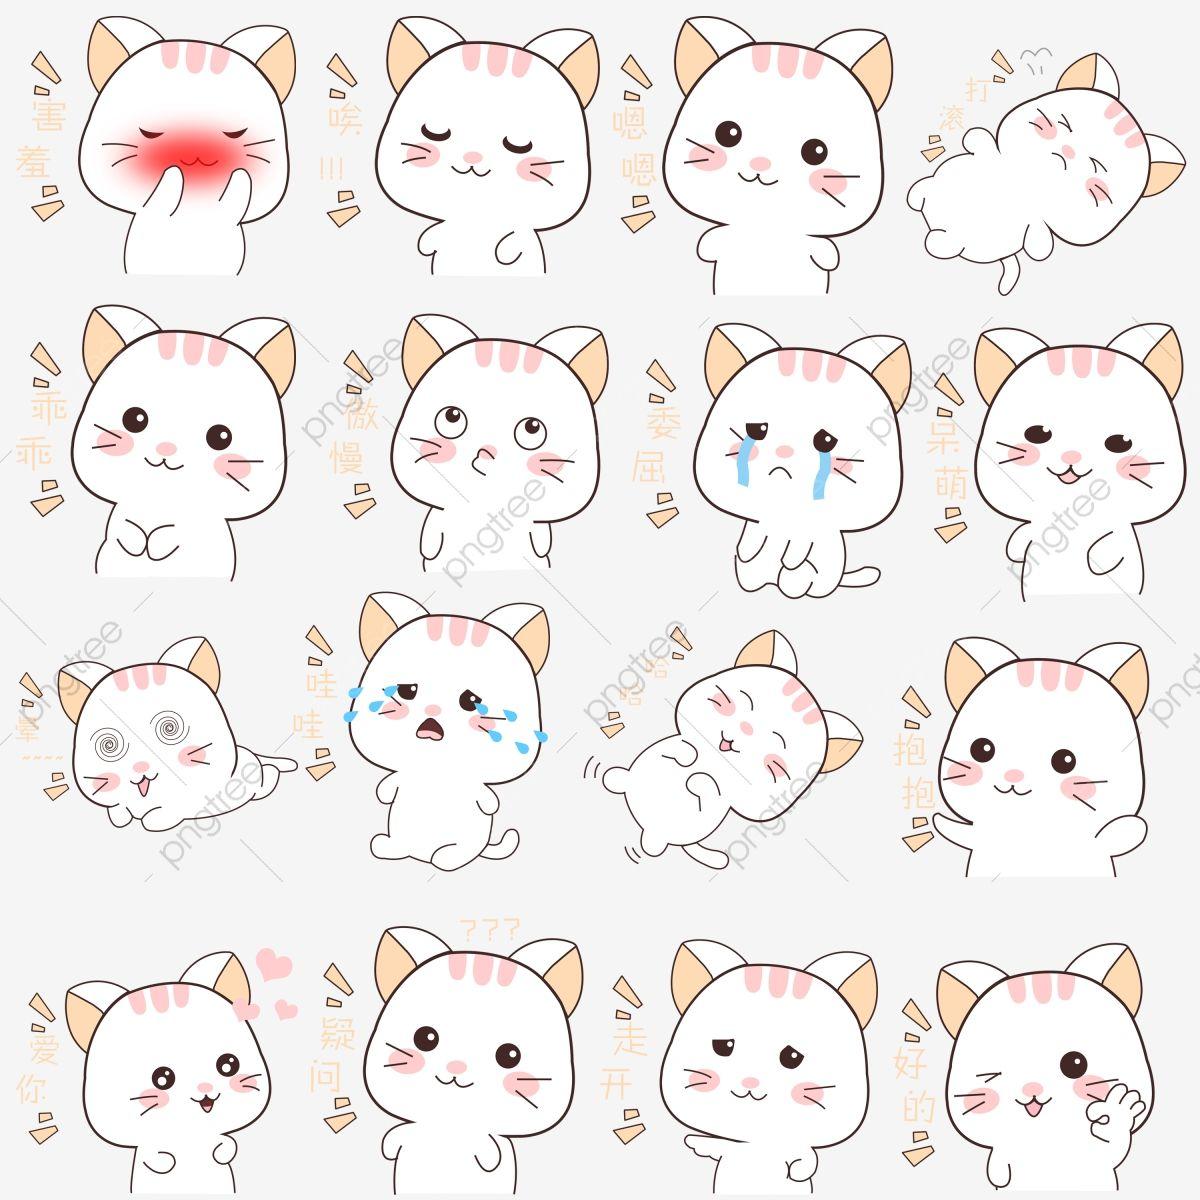 cartoon hand drawn hand painted cat cat expression cartoon kitten kitten expression pack cartoon emoticon pack cartoon drawn png transparent clipart image an ในป 2020 ศ ลปะลายม อ โปสเตอร ภาพ แมว pinterest